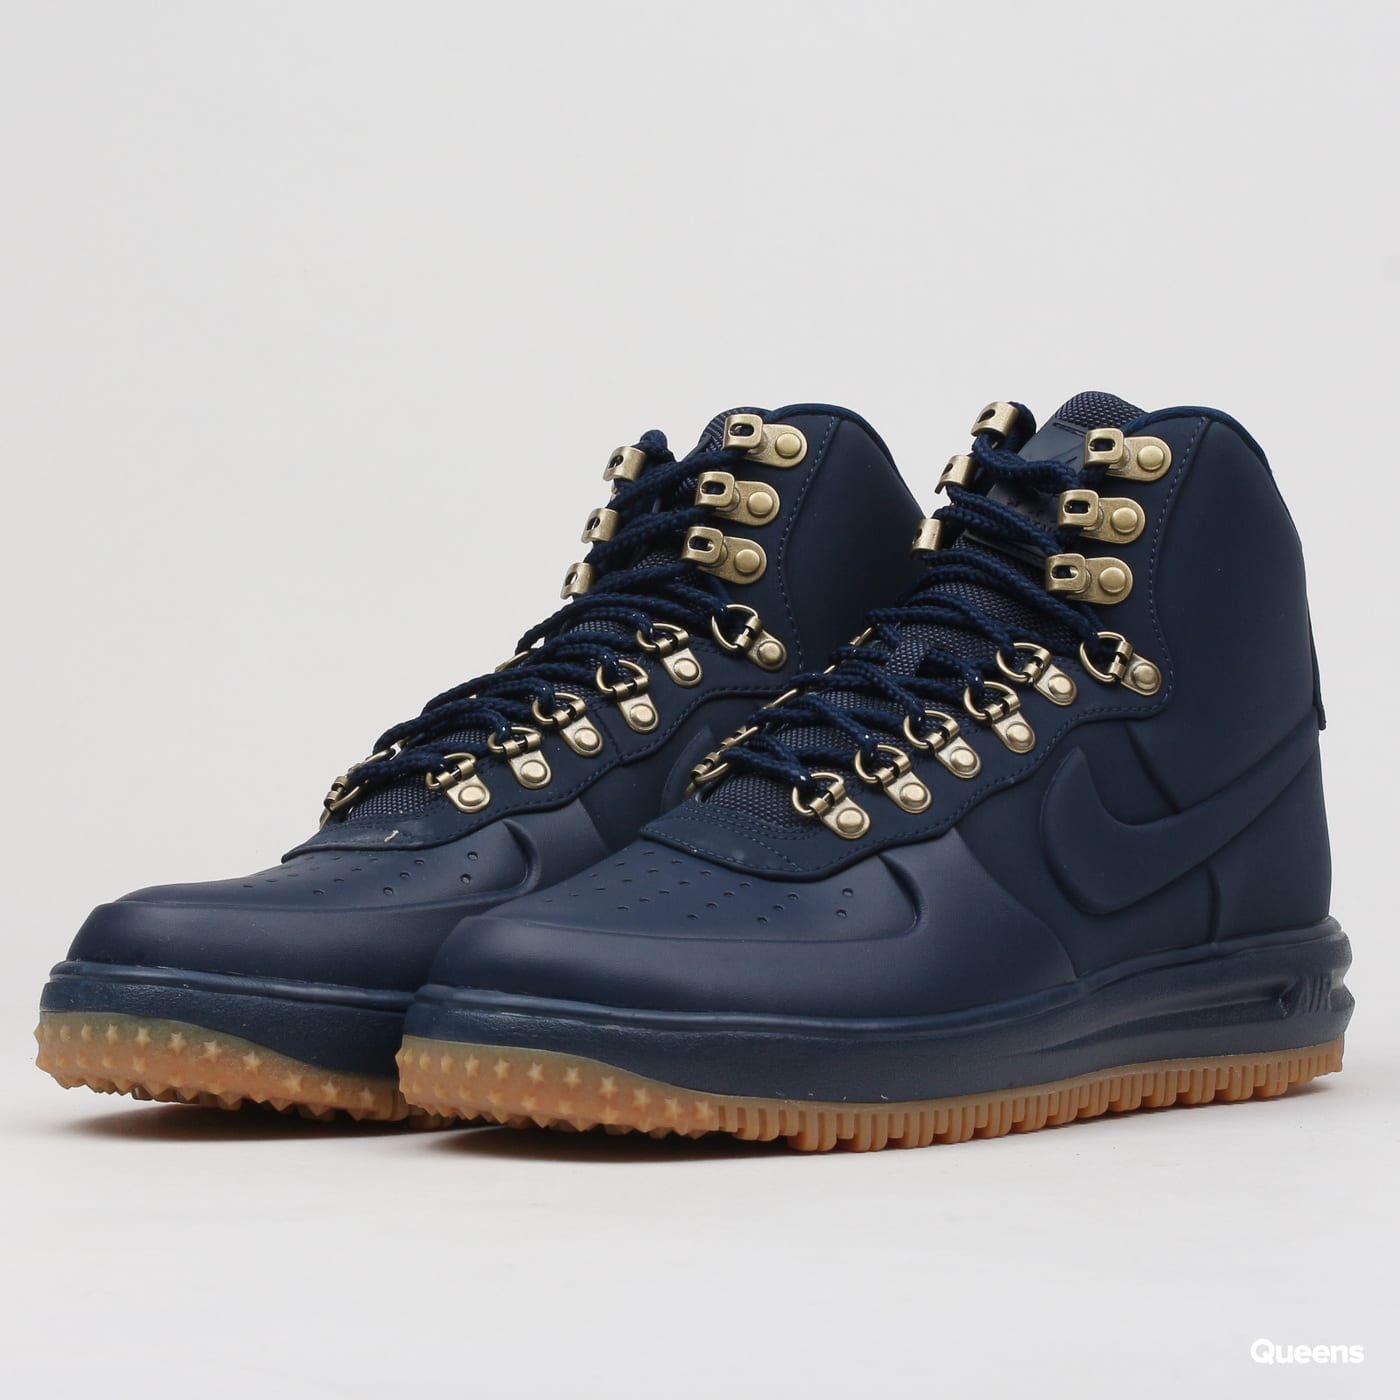 Pánska zimná obuv Nike Lunar Force 1 Duckboot  18 (BQ7930-400)– Queens 💚 9aad8cafa56